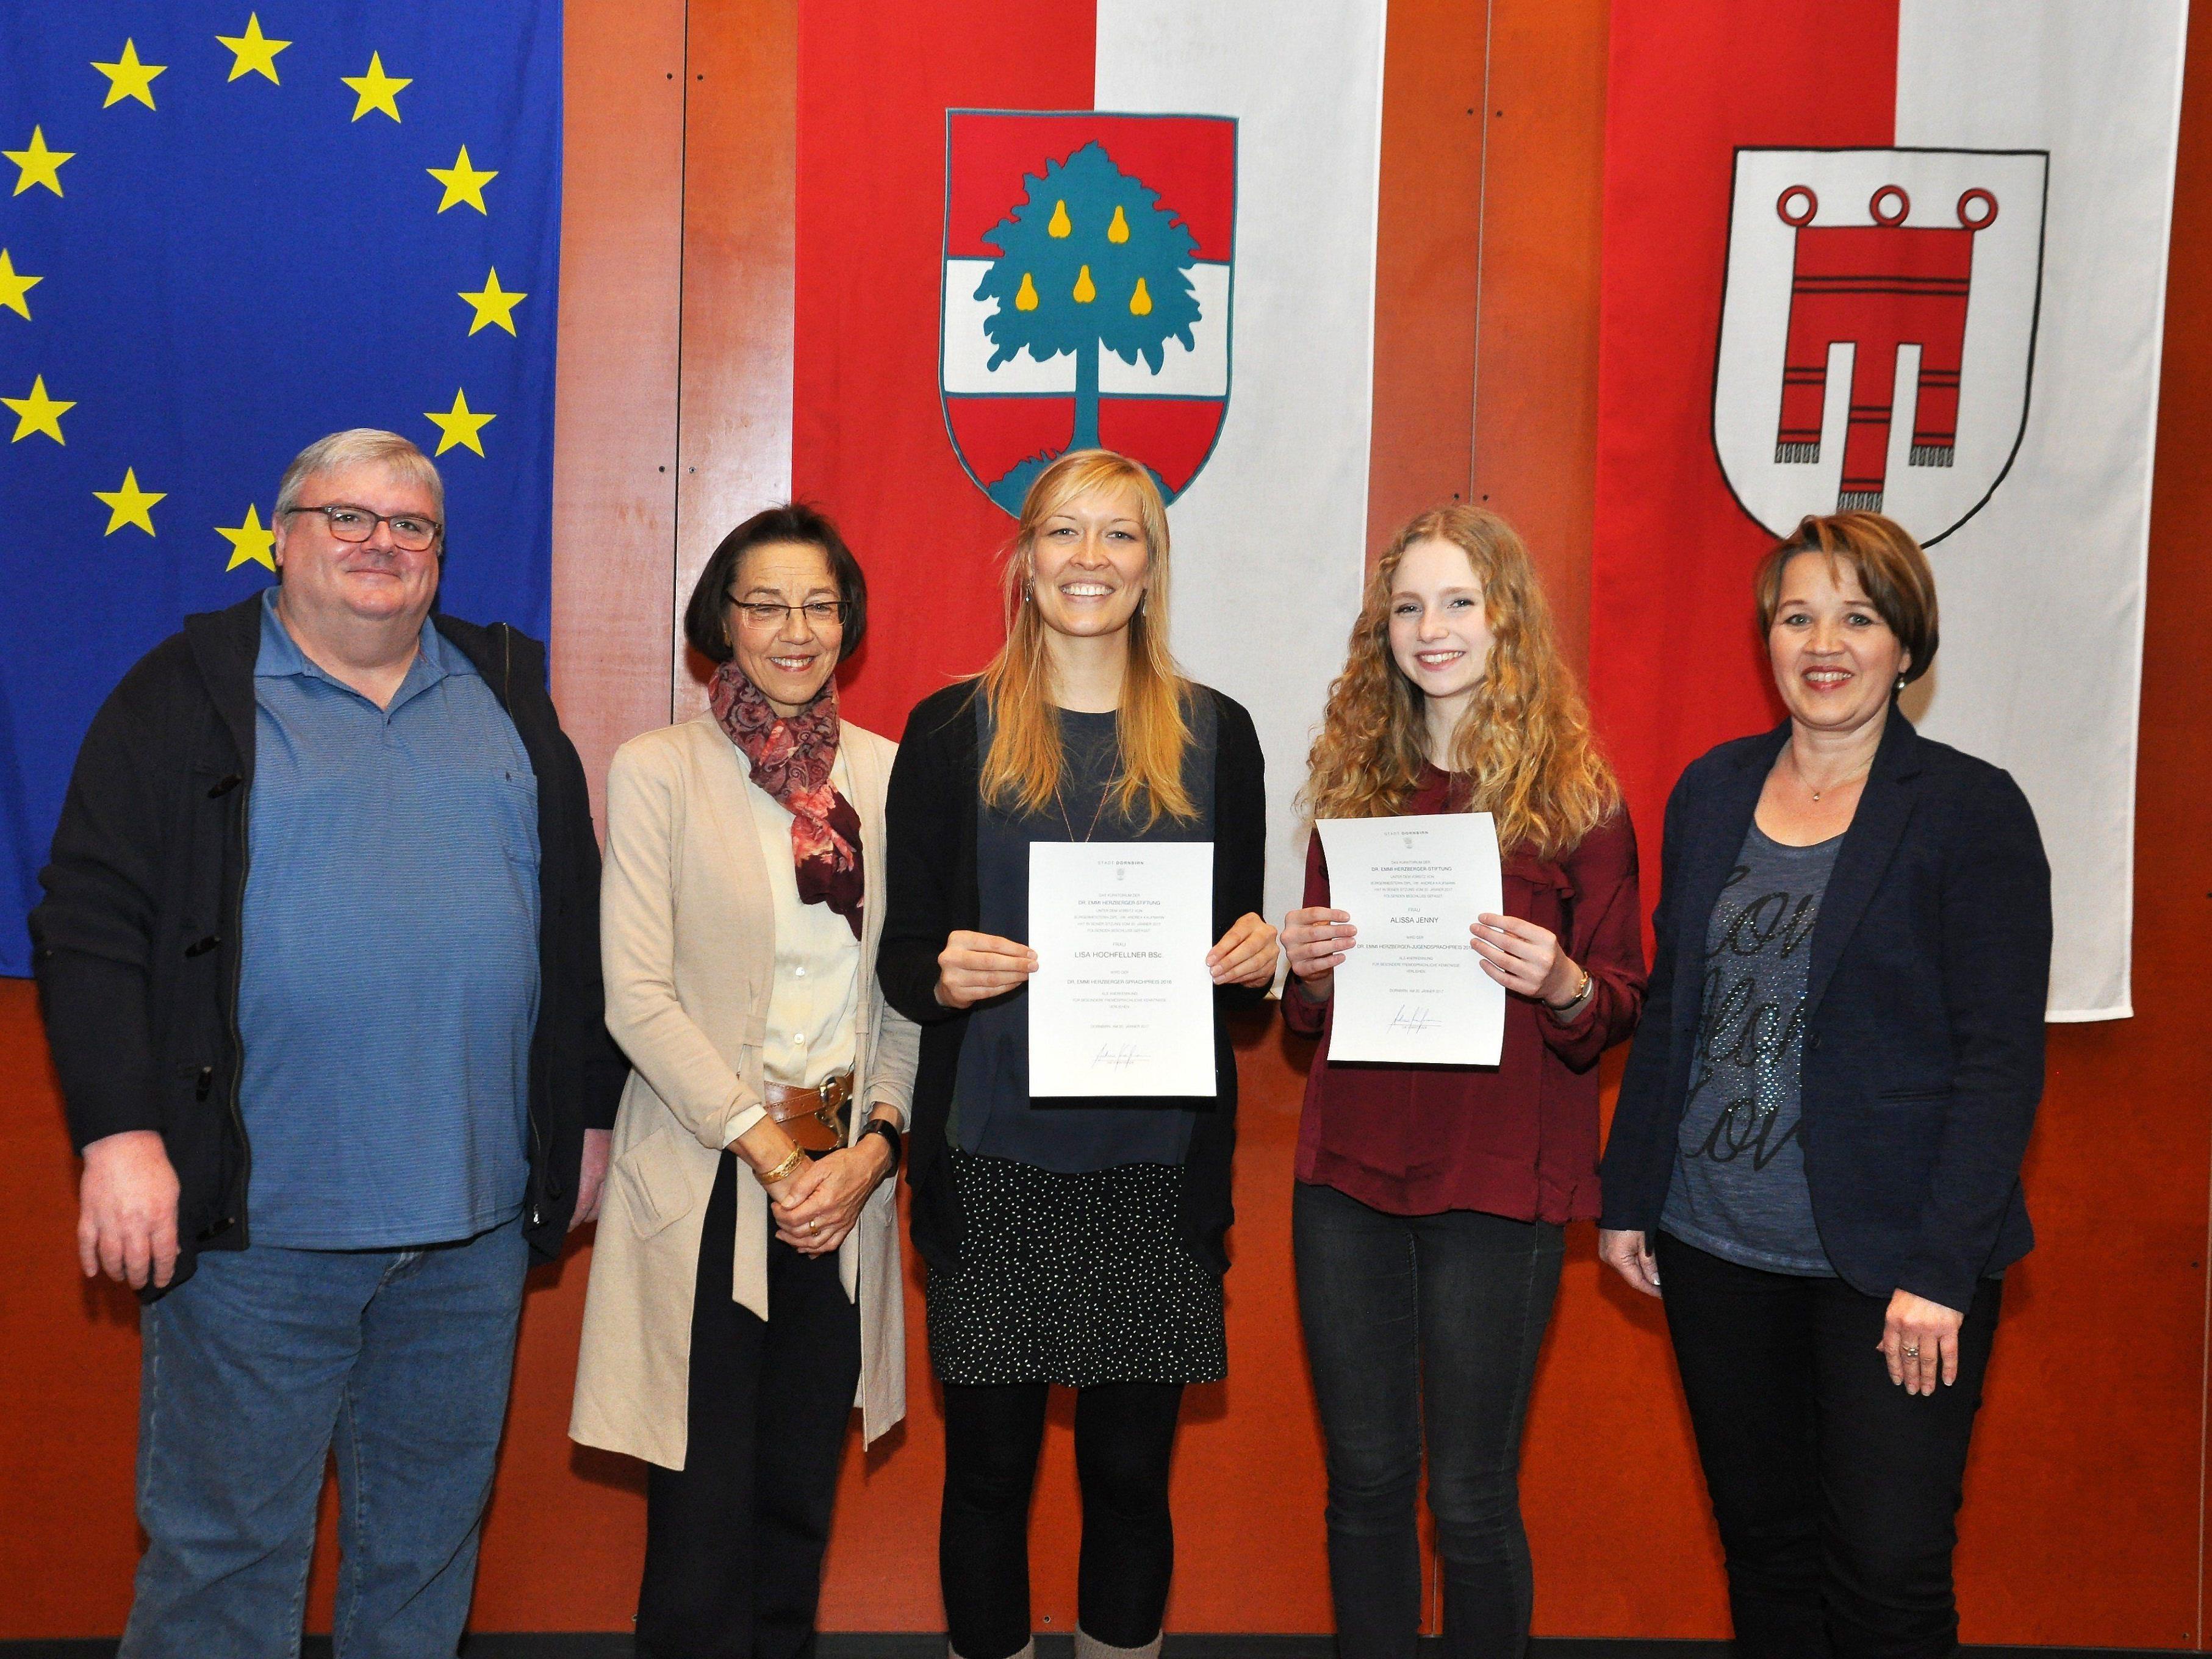 Die Preisträgerinnen mit dem 3er-Kuratorium (v.l.n.r.: Dr.Werner Marxgut, Dr. Eva-Maria Waibel, Bürgermeisterin Andrea Kaufmann.)